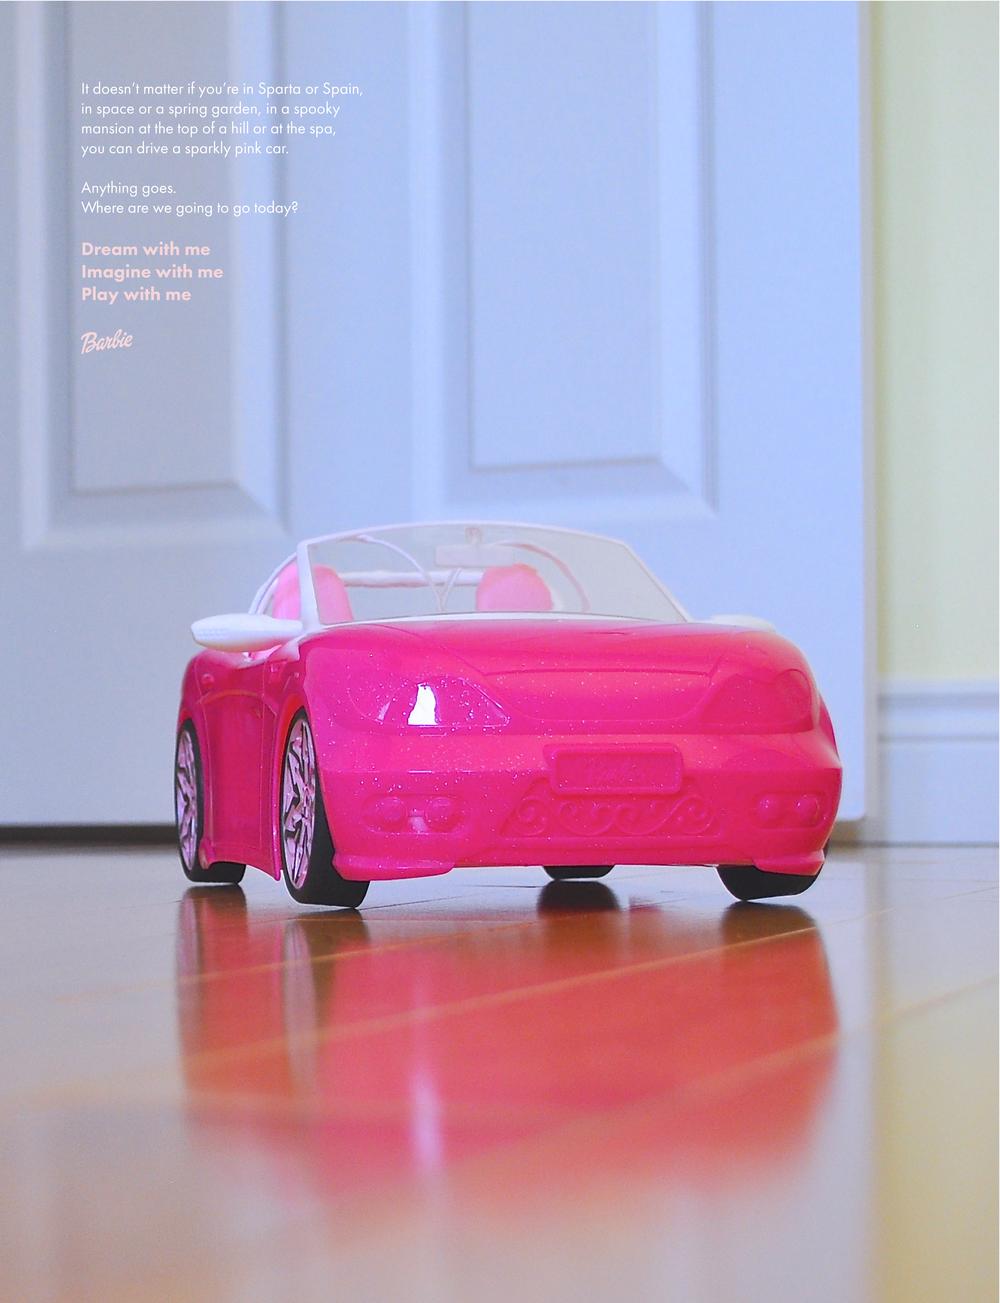 Barbe+Print+Ad+(Pink)32.png